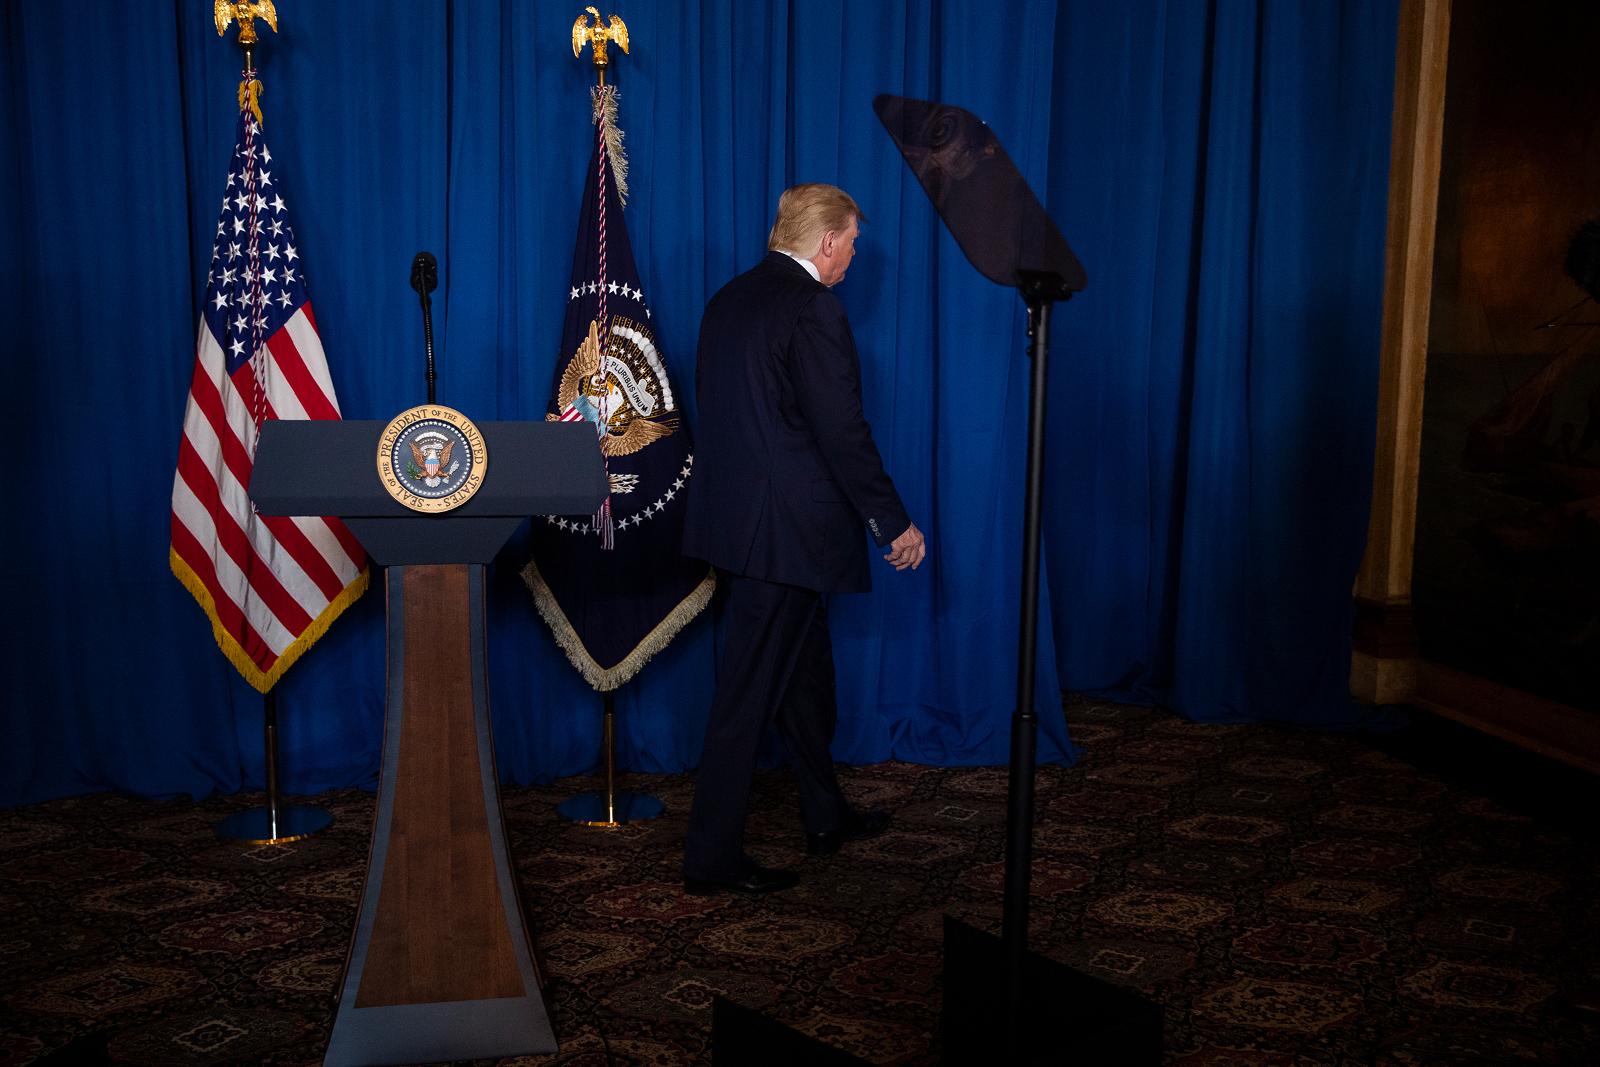 Trump walks off after delivering remarks on Iran